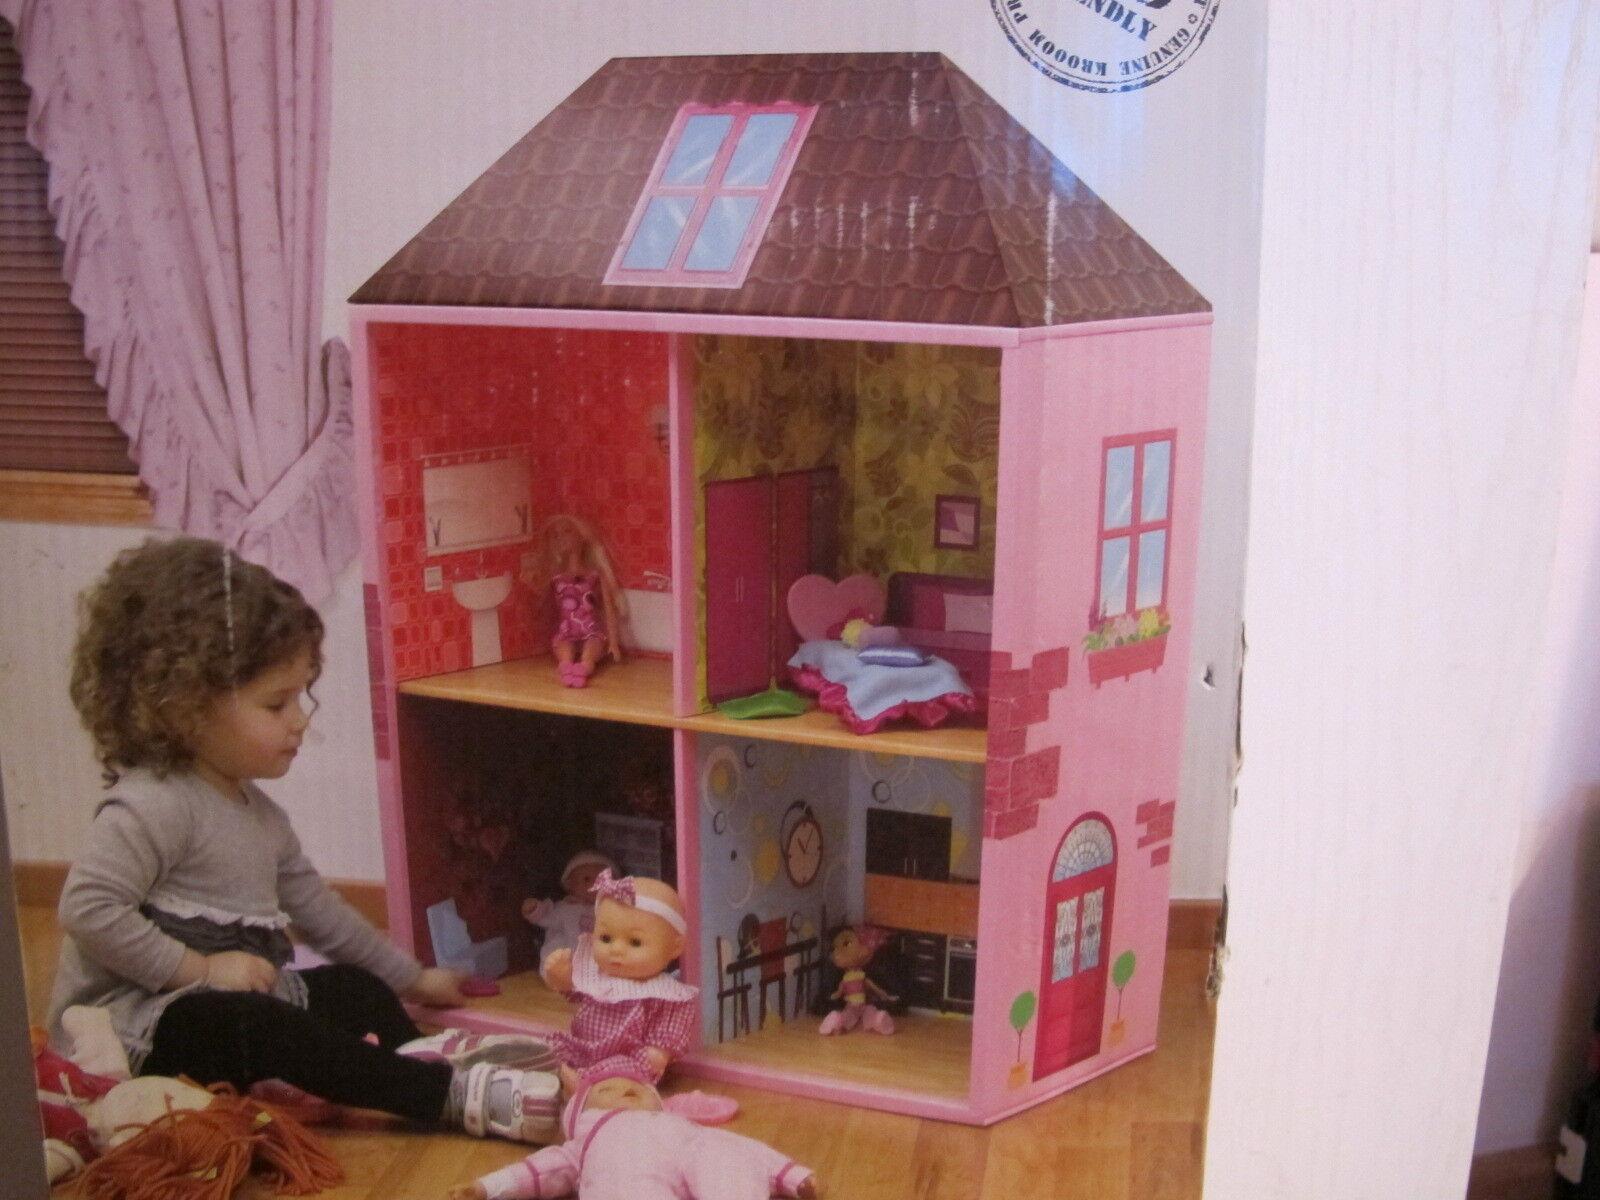 krooom puppenhaus dollhouse bookcase gro es puppenhaus aus pappe neu eur 29 77 picclick de. Black Bedroom Furniture Sets. Home Design Ideas